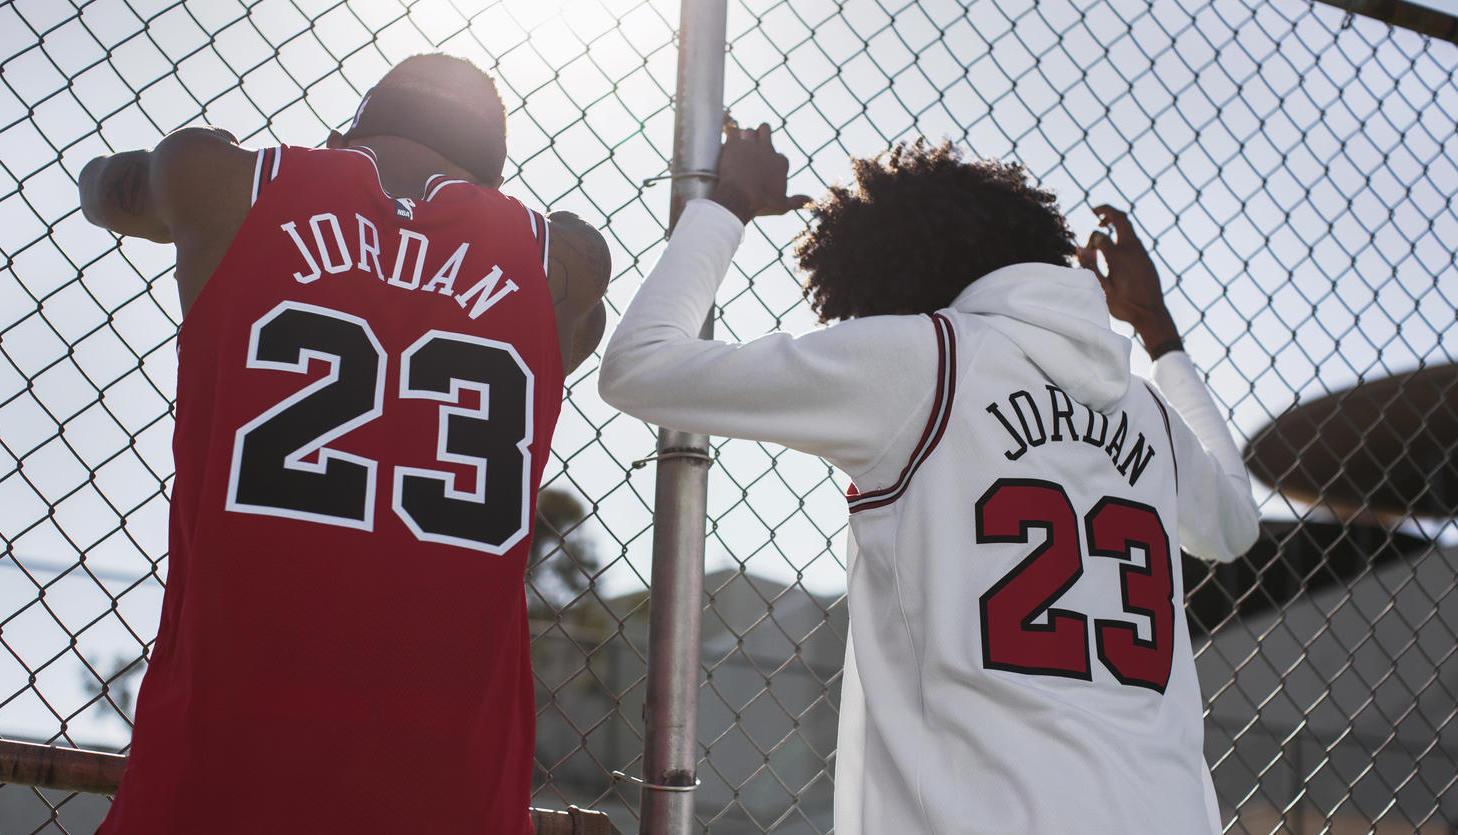 Nike relanza la legendaria camiseta No. 23 de Michael Jordan